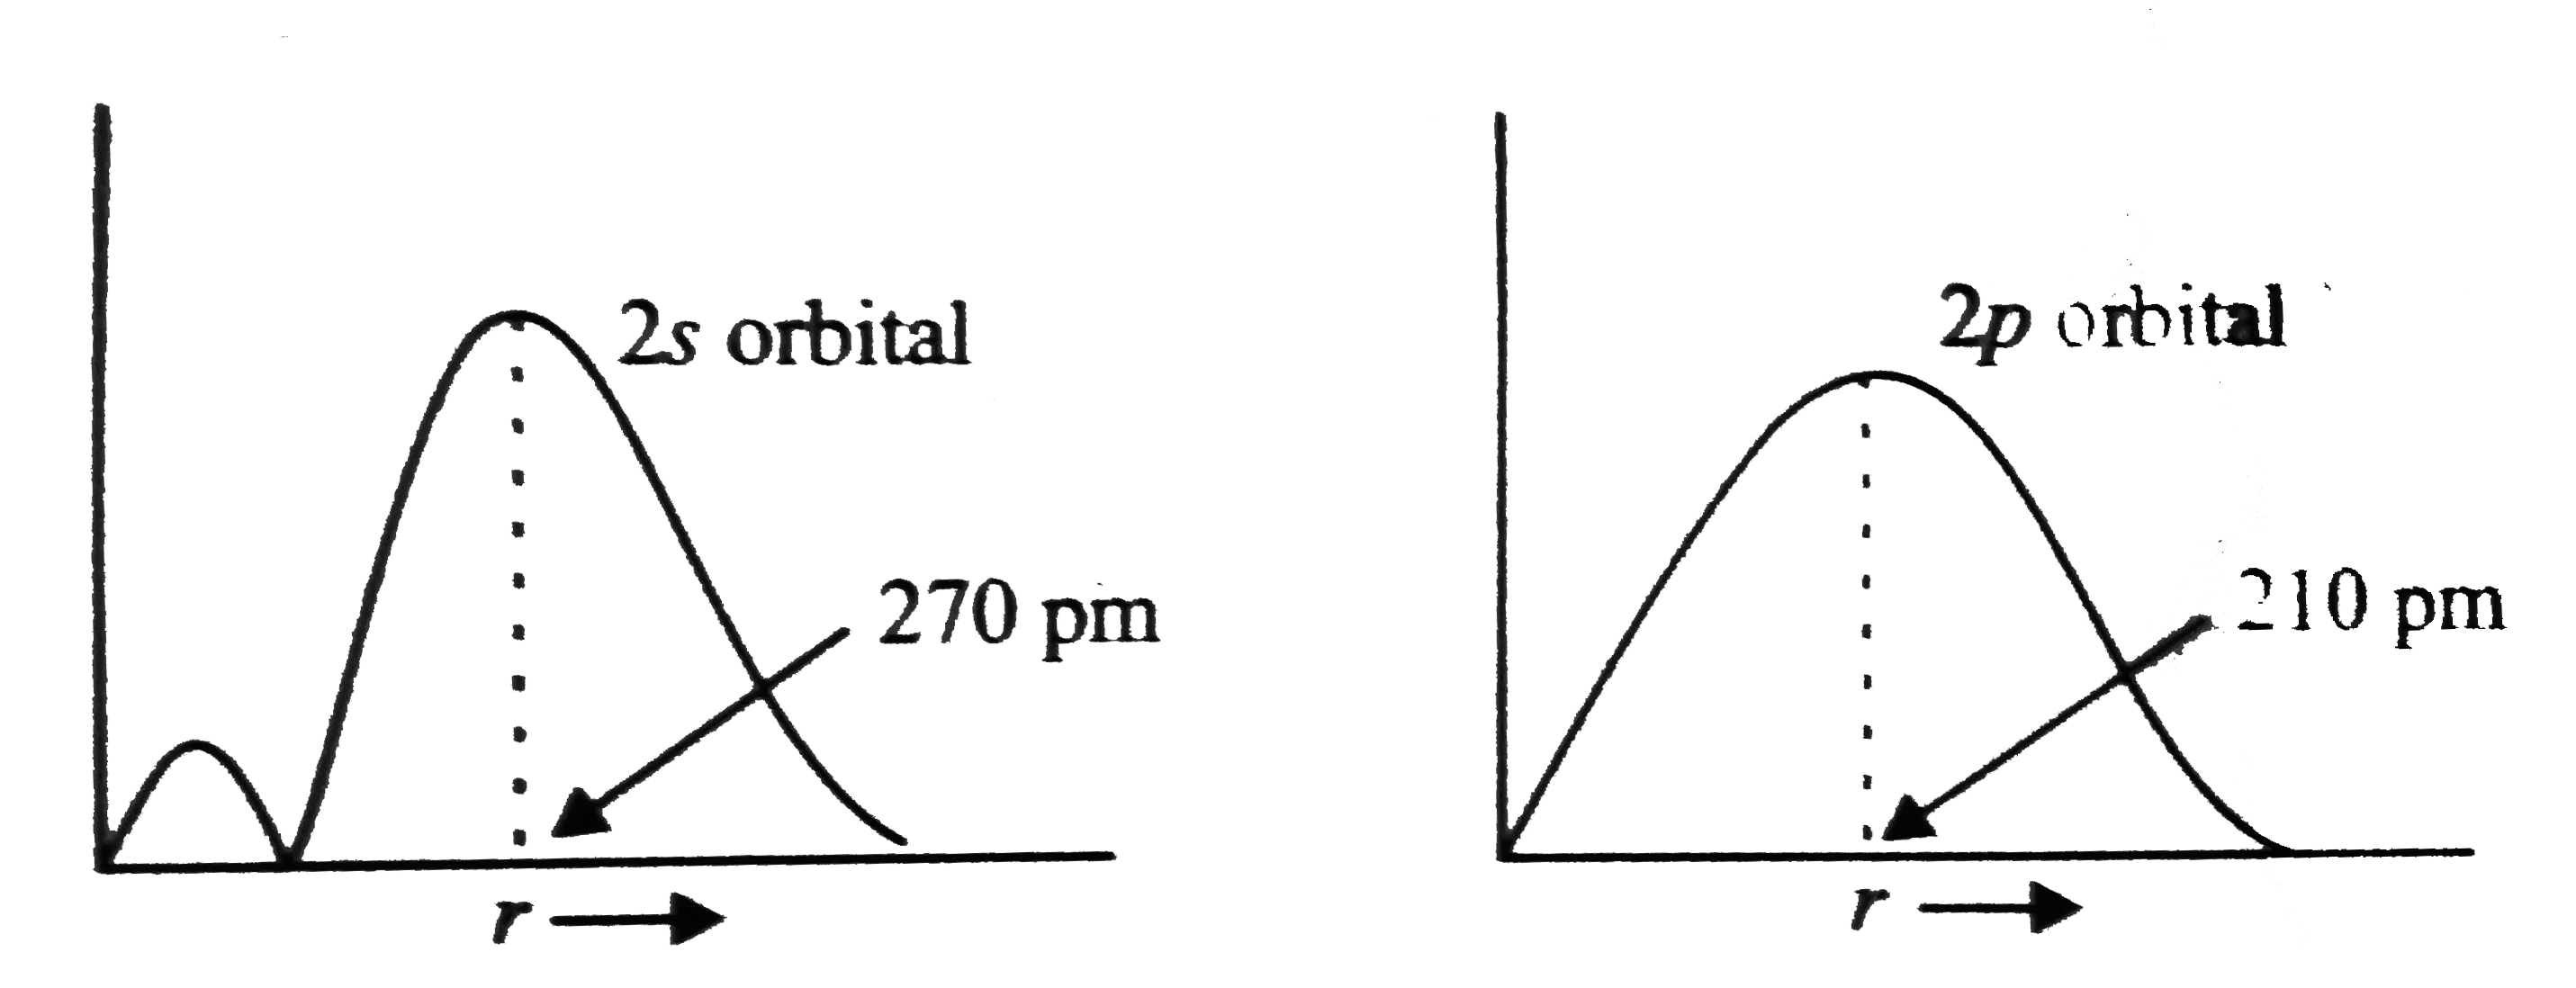 Draw The Radial Prodabilirty Distritation Corve For 2p Elelctro